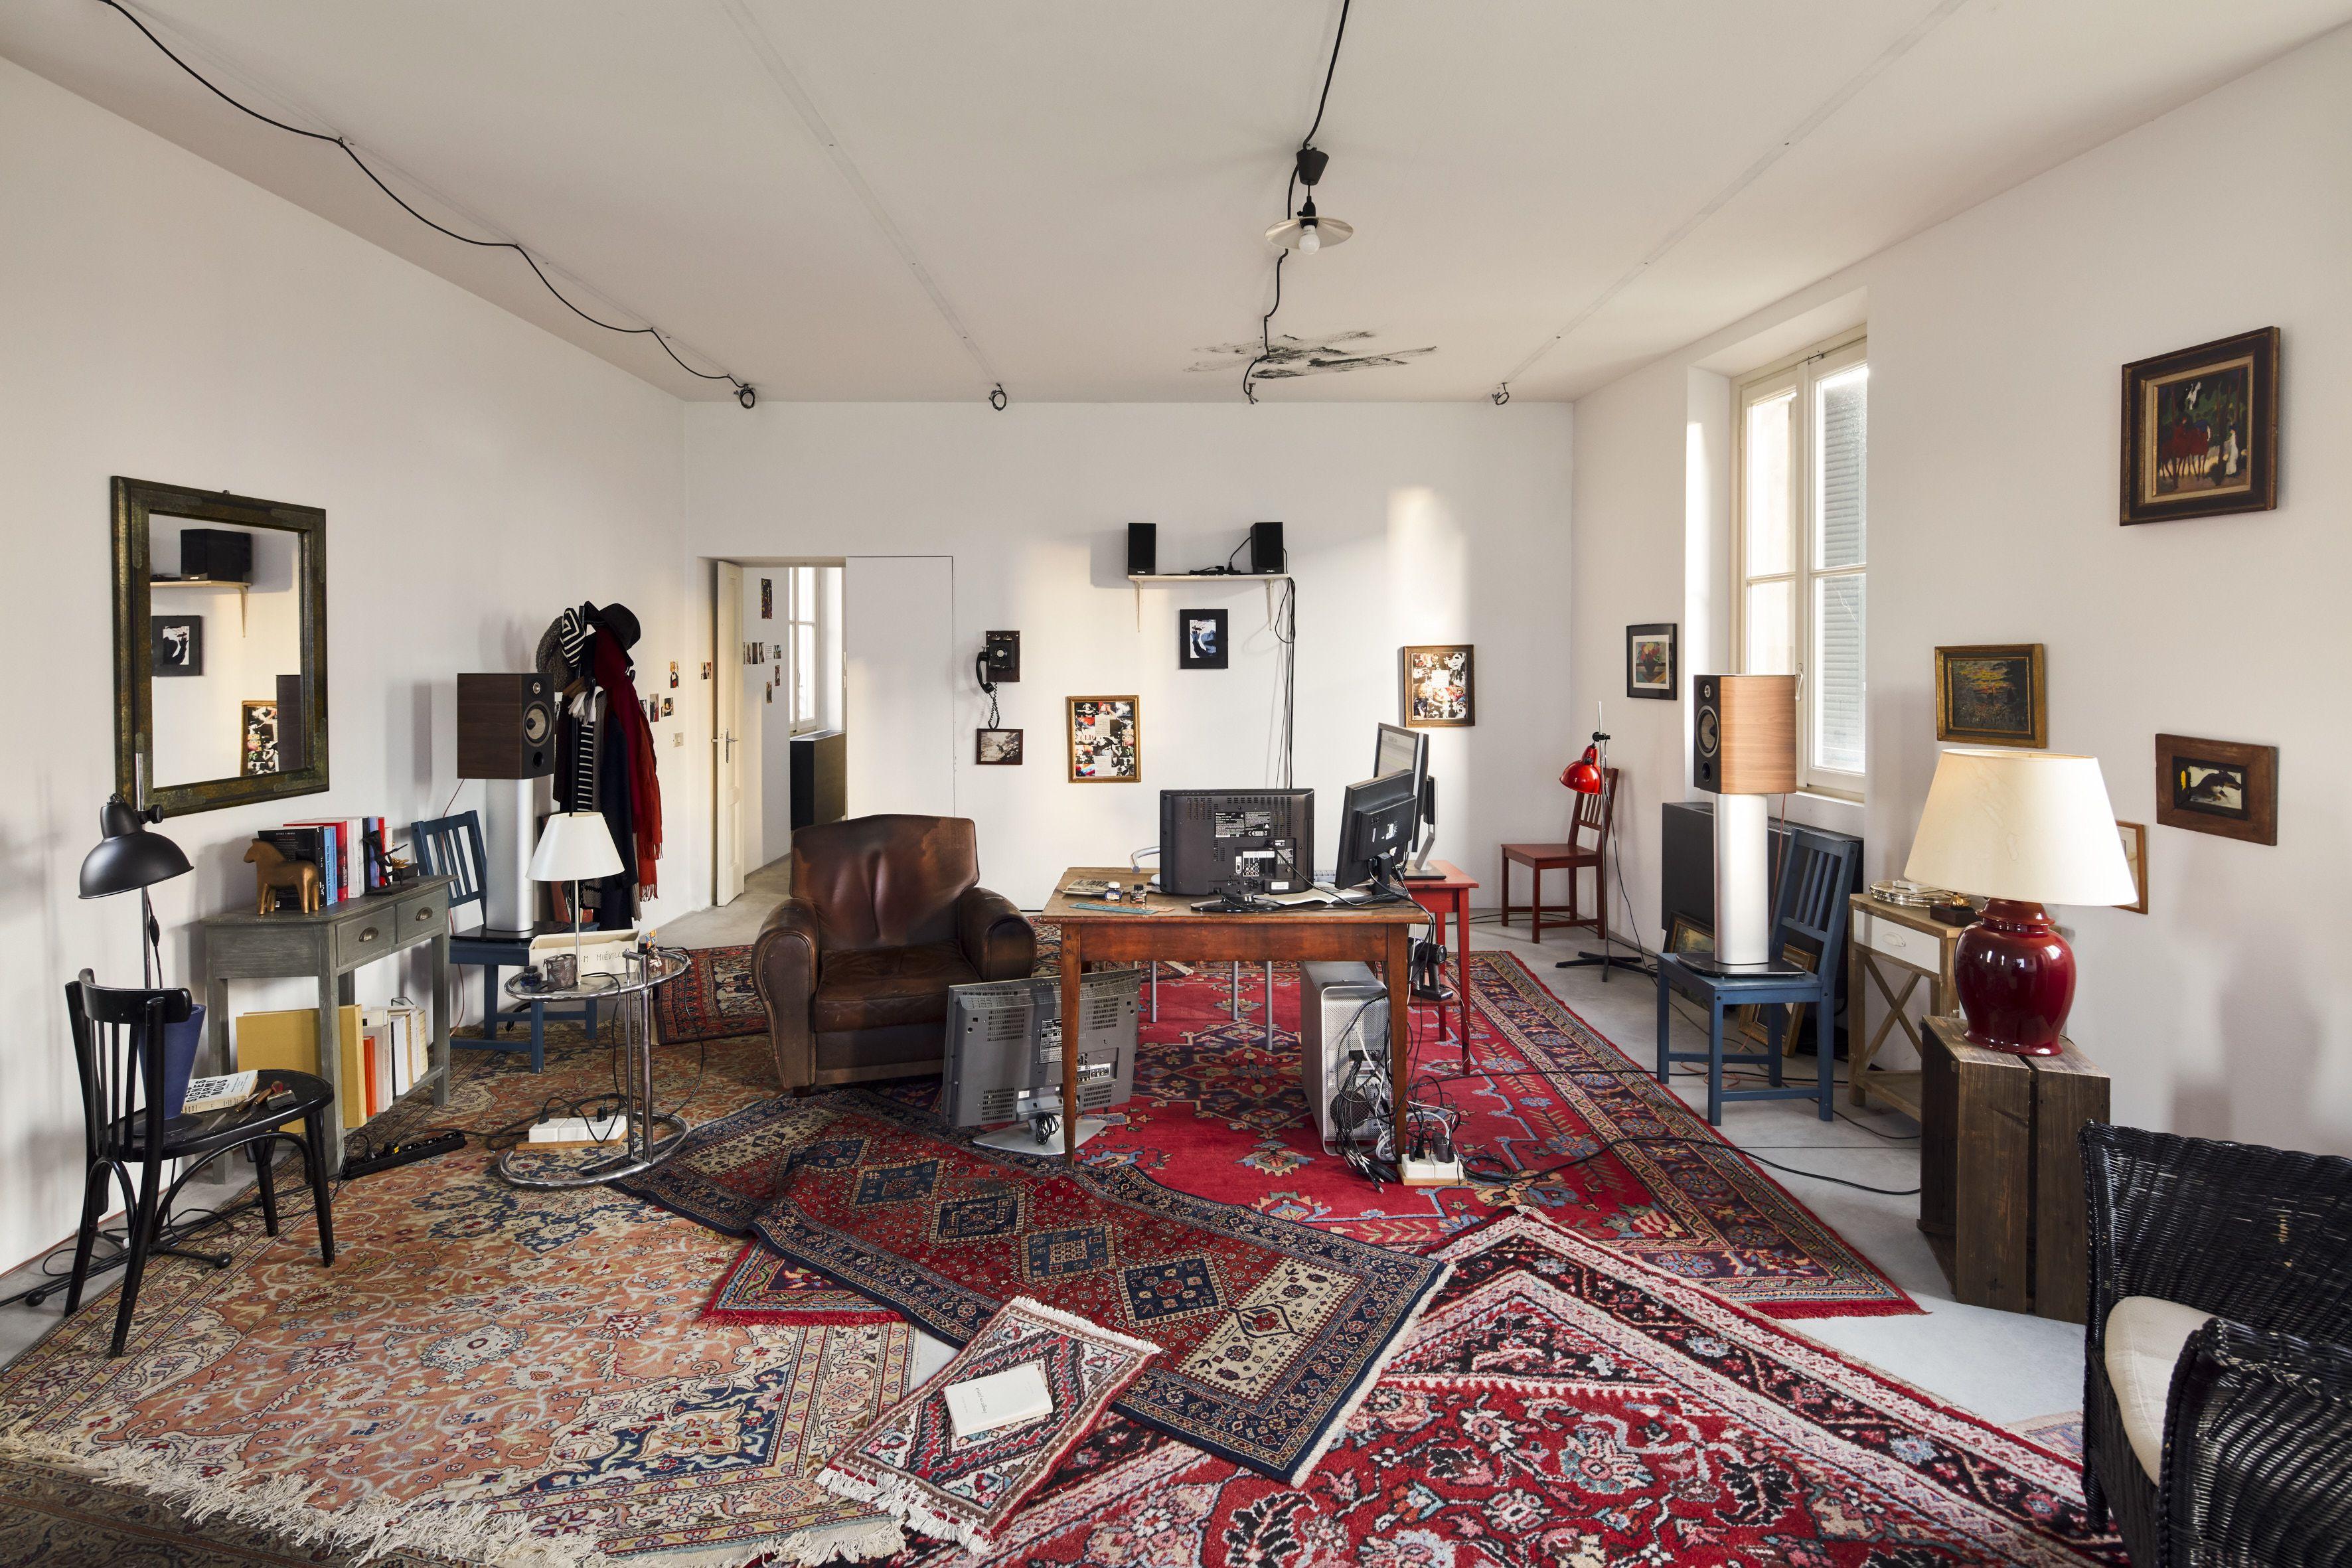 Iconic Filmmaker Jean-Luc Godard Channels Greek Mythology for New Fondazione Prada Project